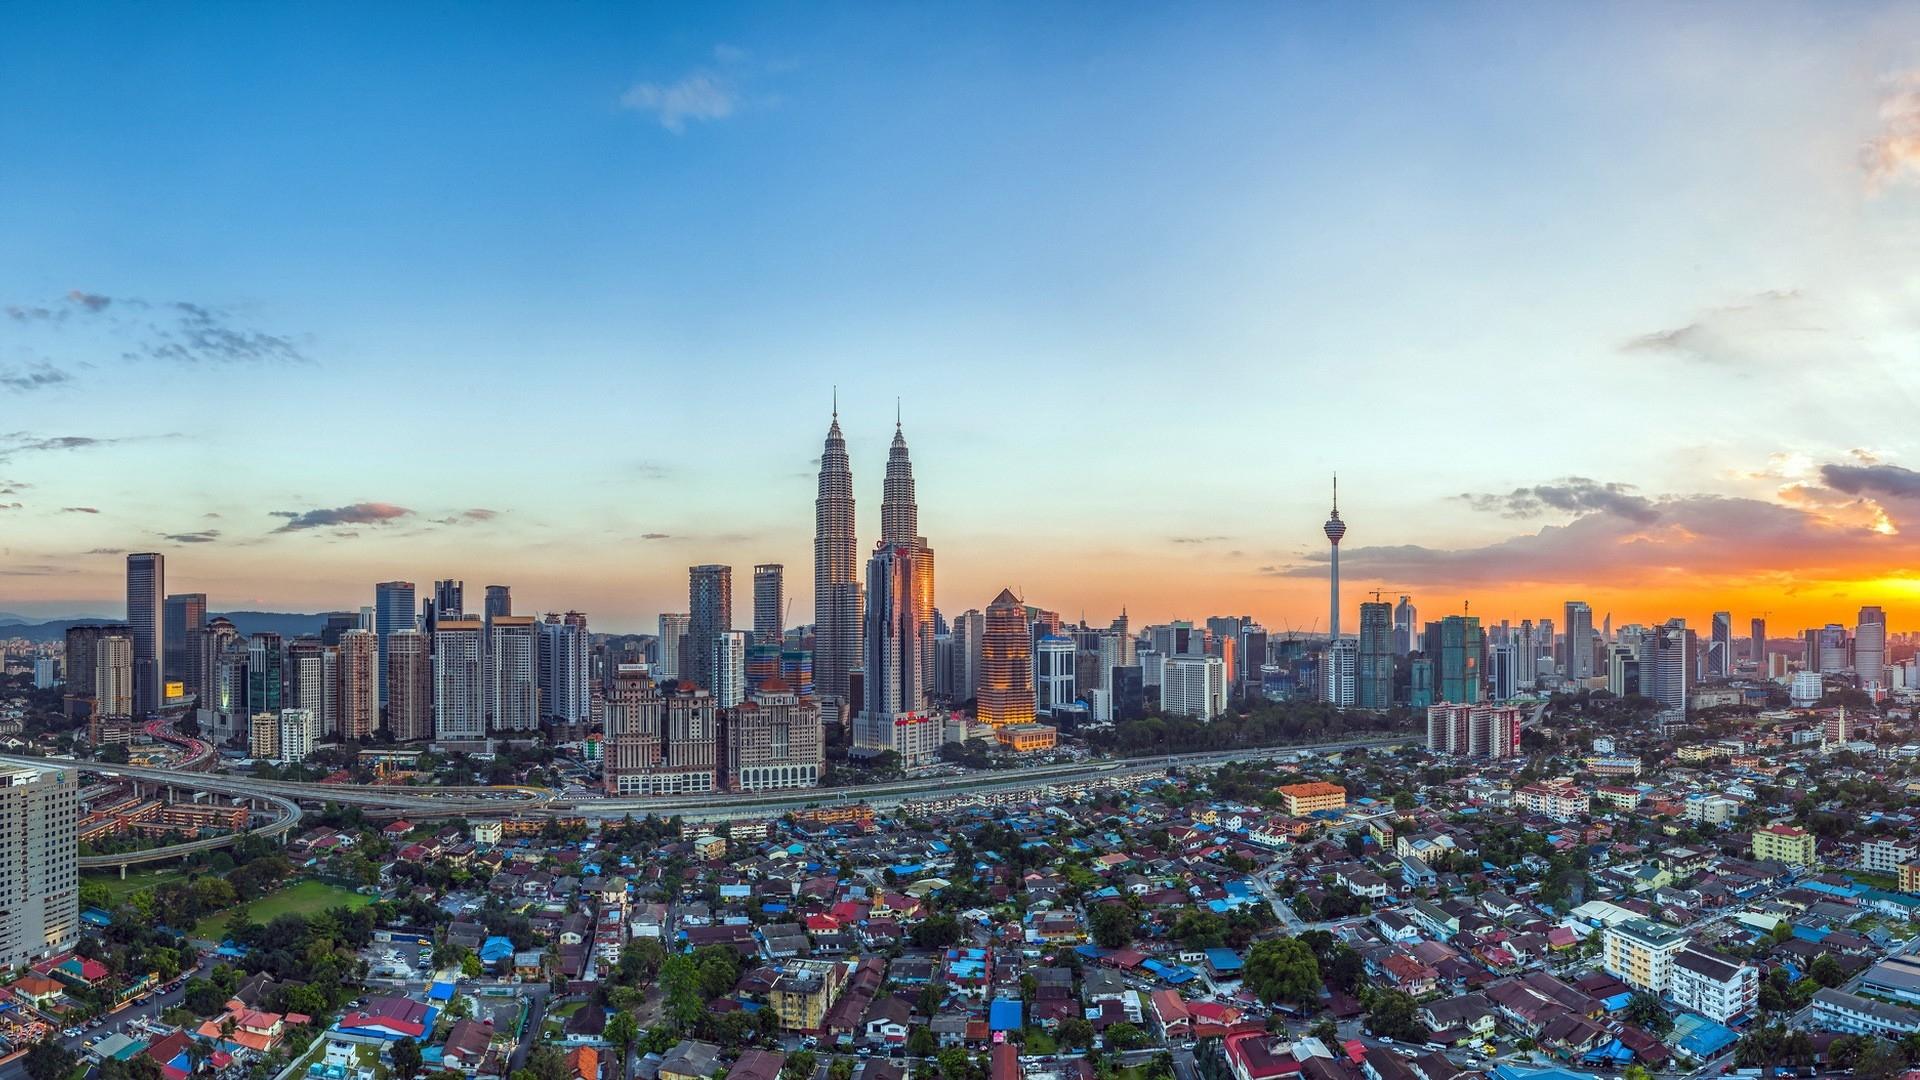 Malaysia Petronas Twin Towers Sky Top View 85517 1920x1080